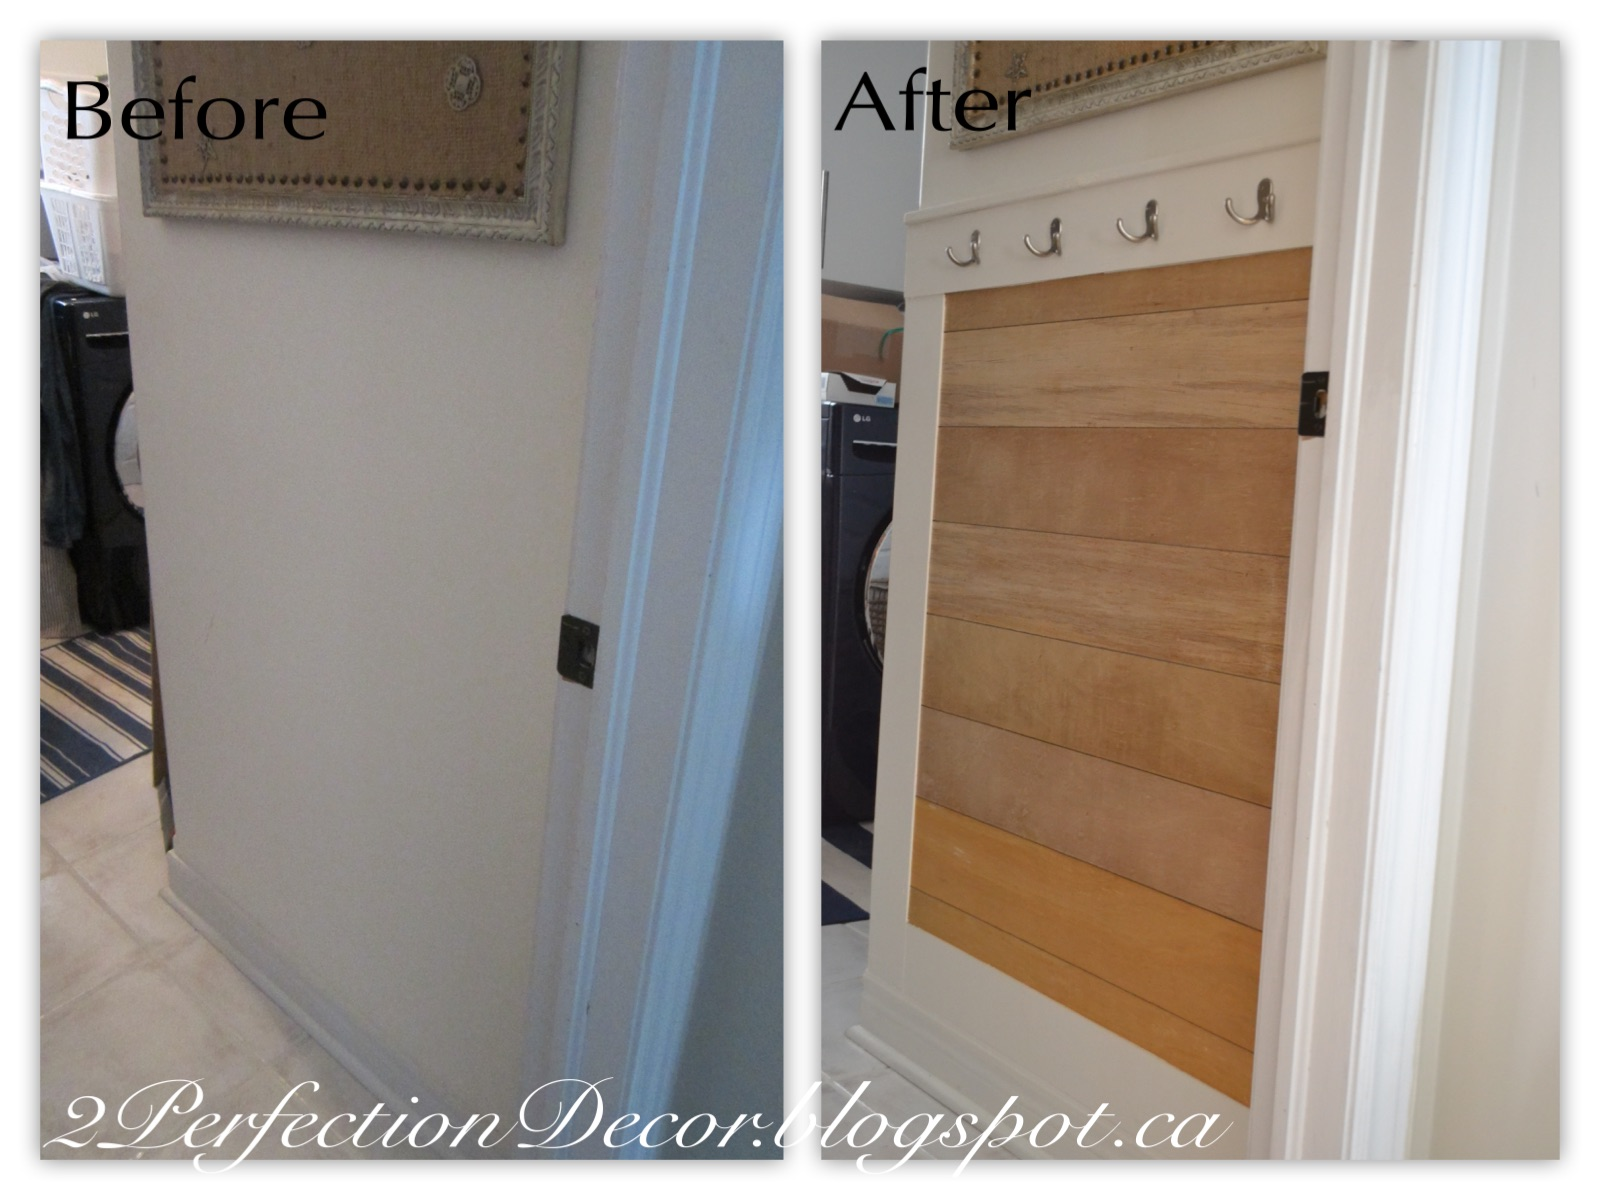 2perfection decor diy laundry mudroom wall hooks diy laundry mudroom wall hooks amipublicfo Gallery